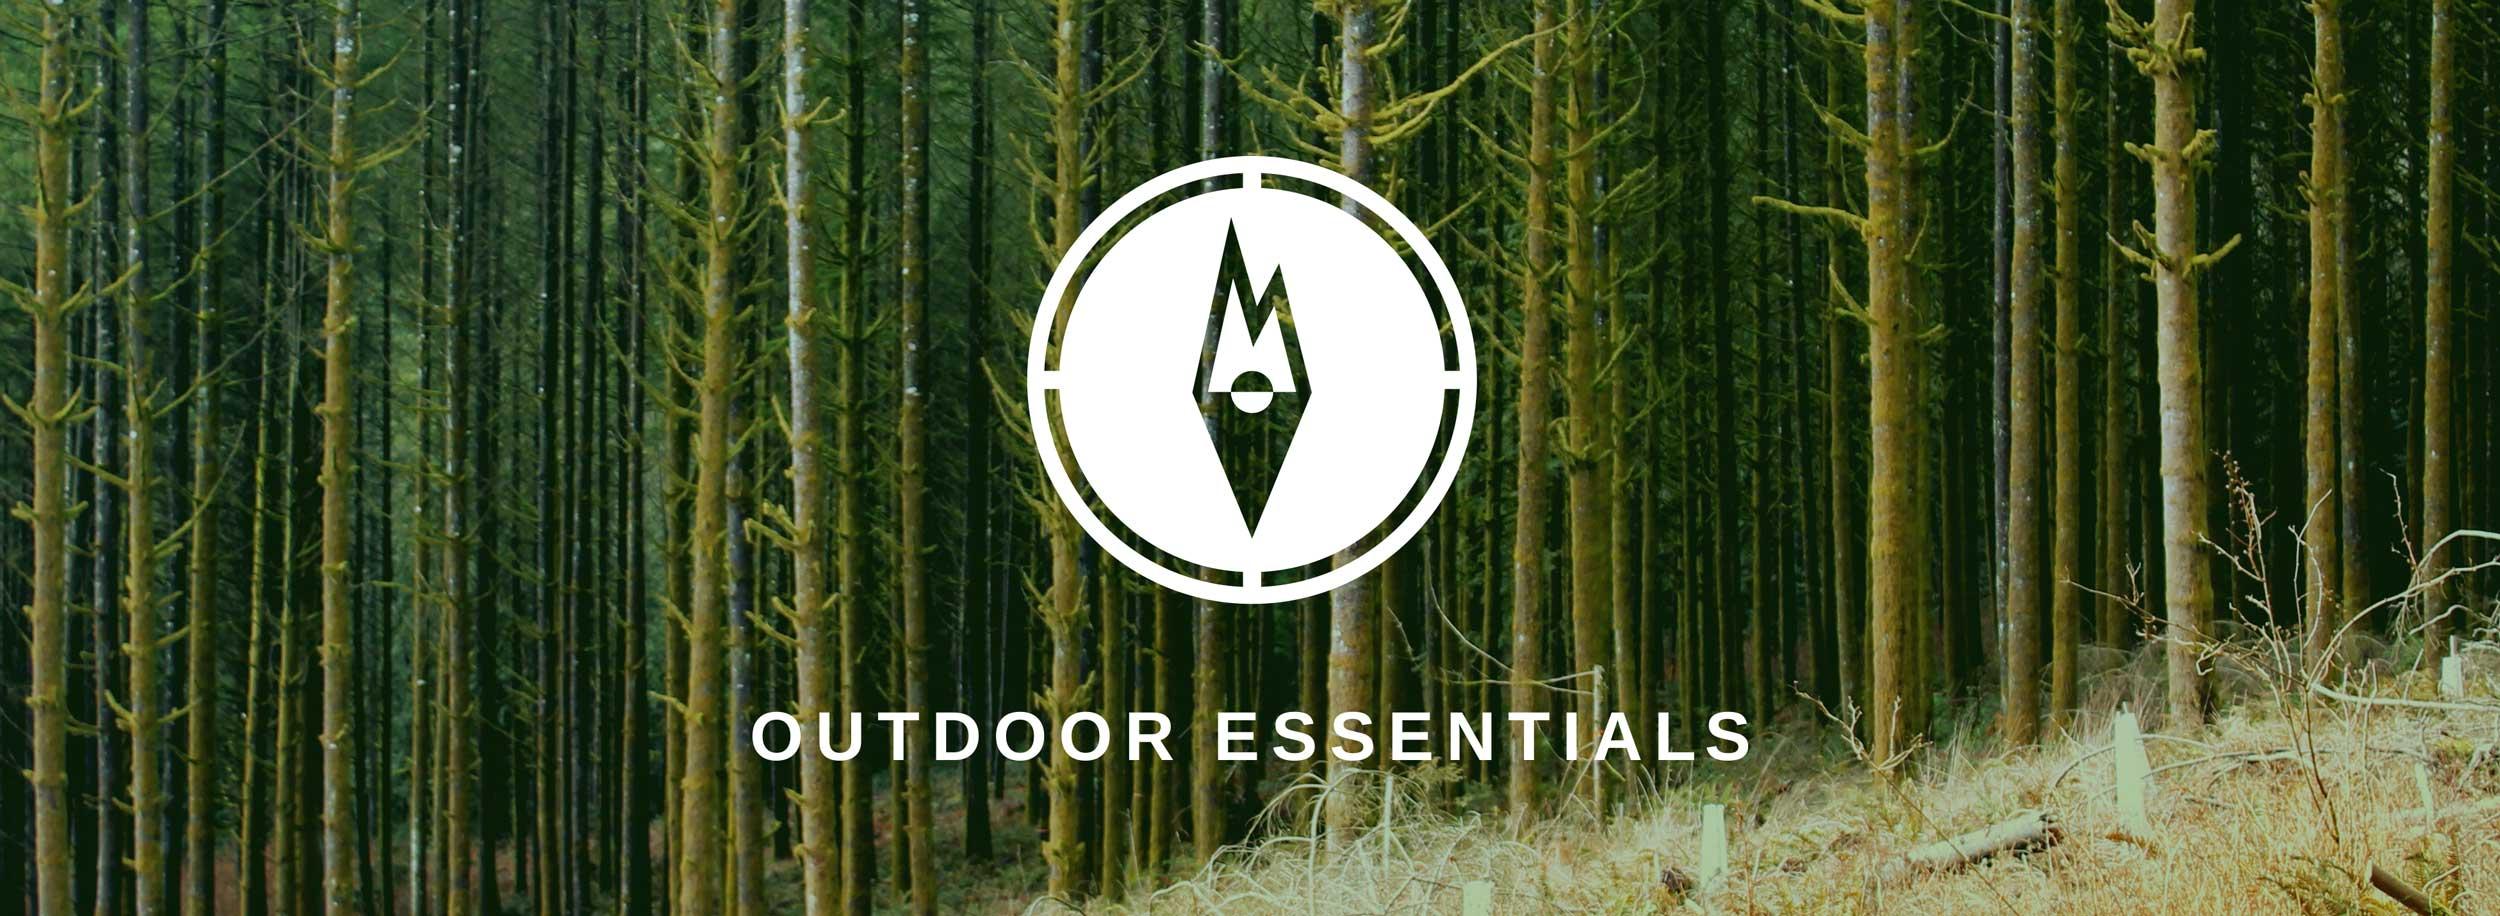 Mountain + Compass visuals form a unique symbol for Outdoor Essentials brand © LET'S PANDA